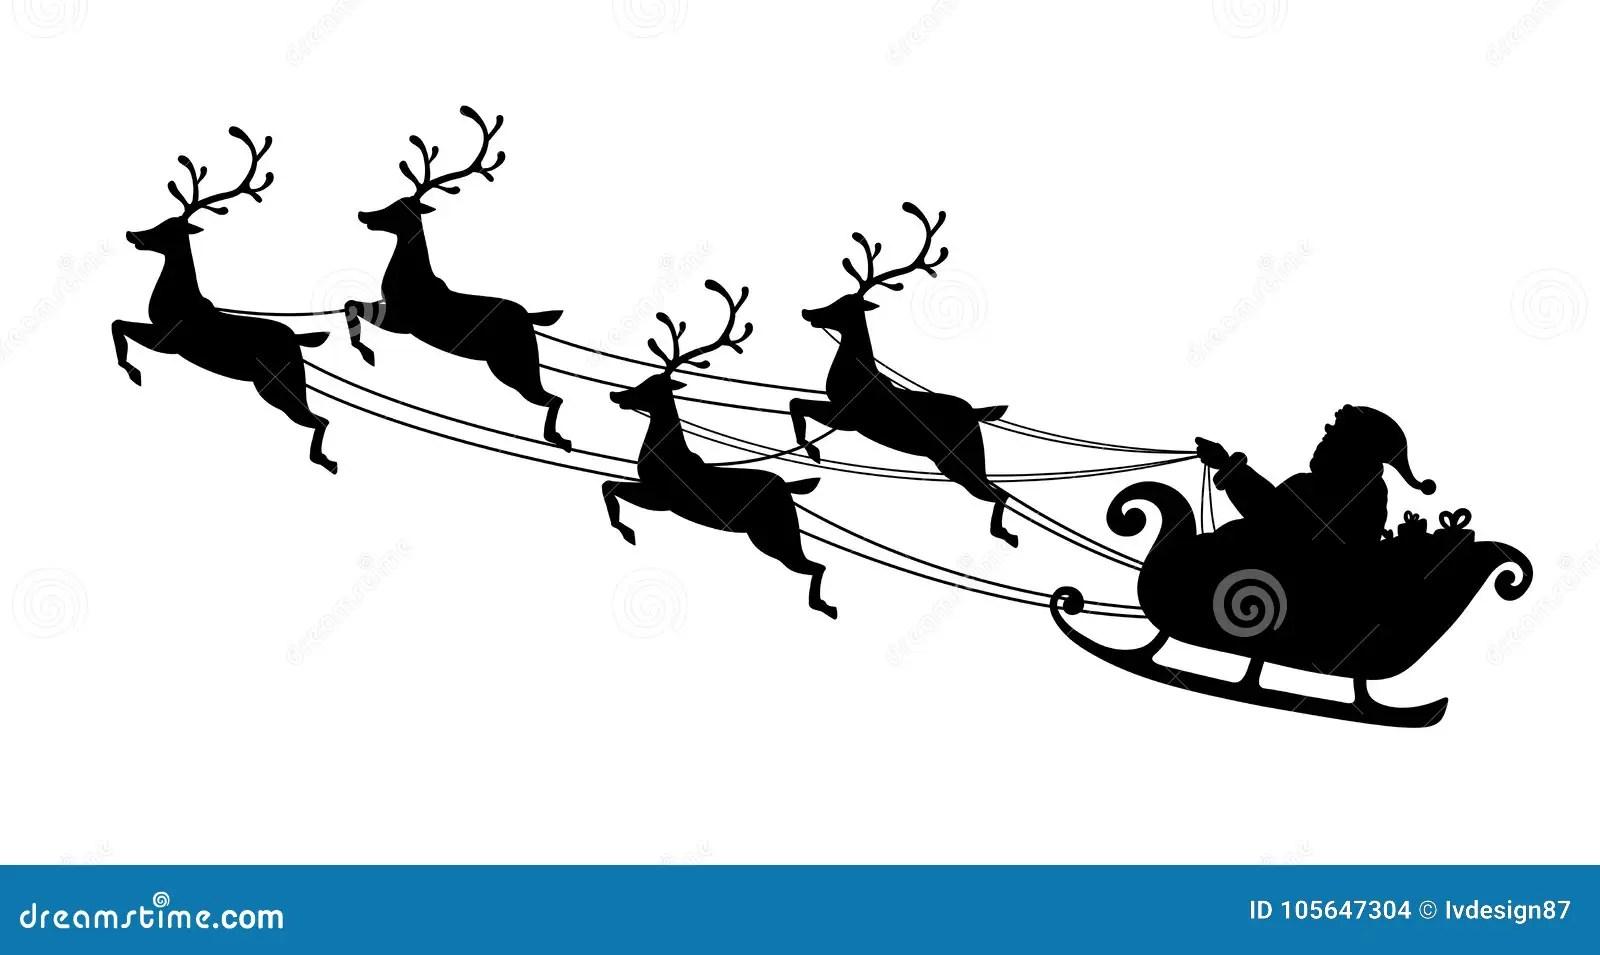 Santa Claus Flying With Reindeer Sleigh Black Silhouette